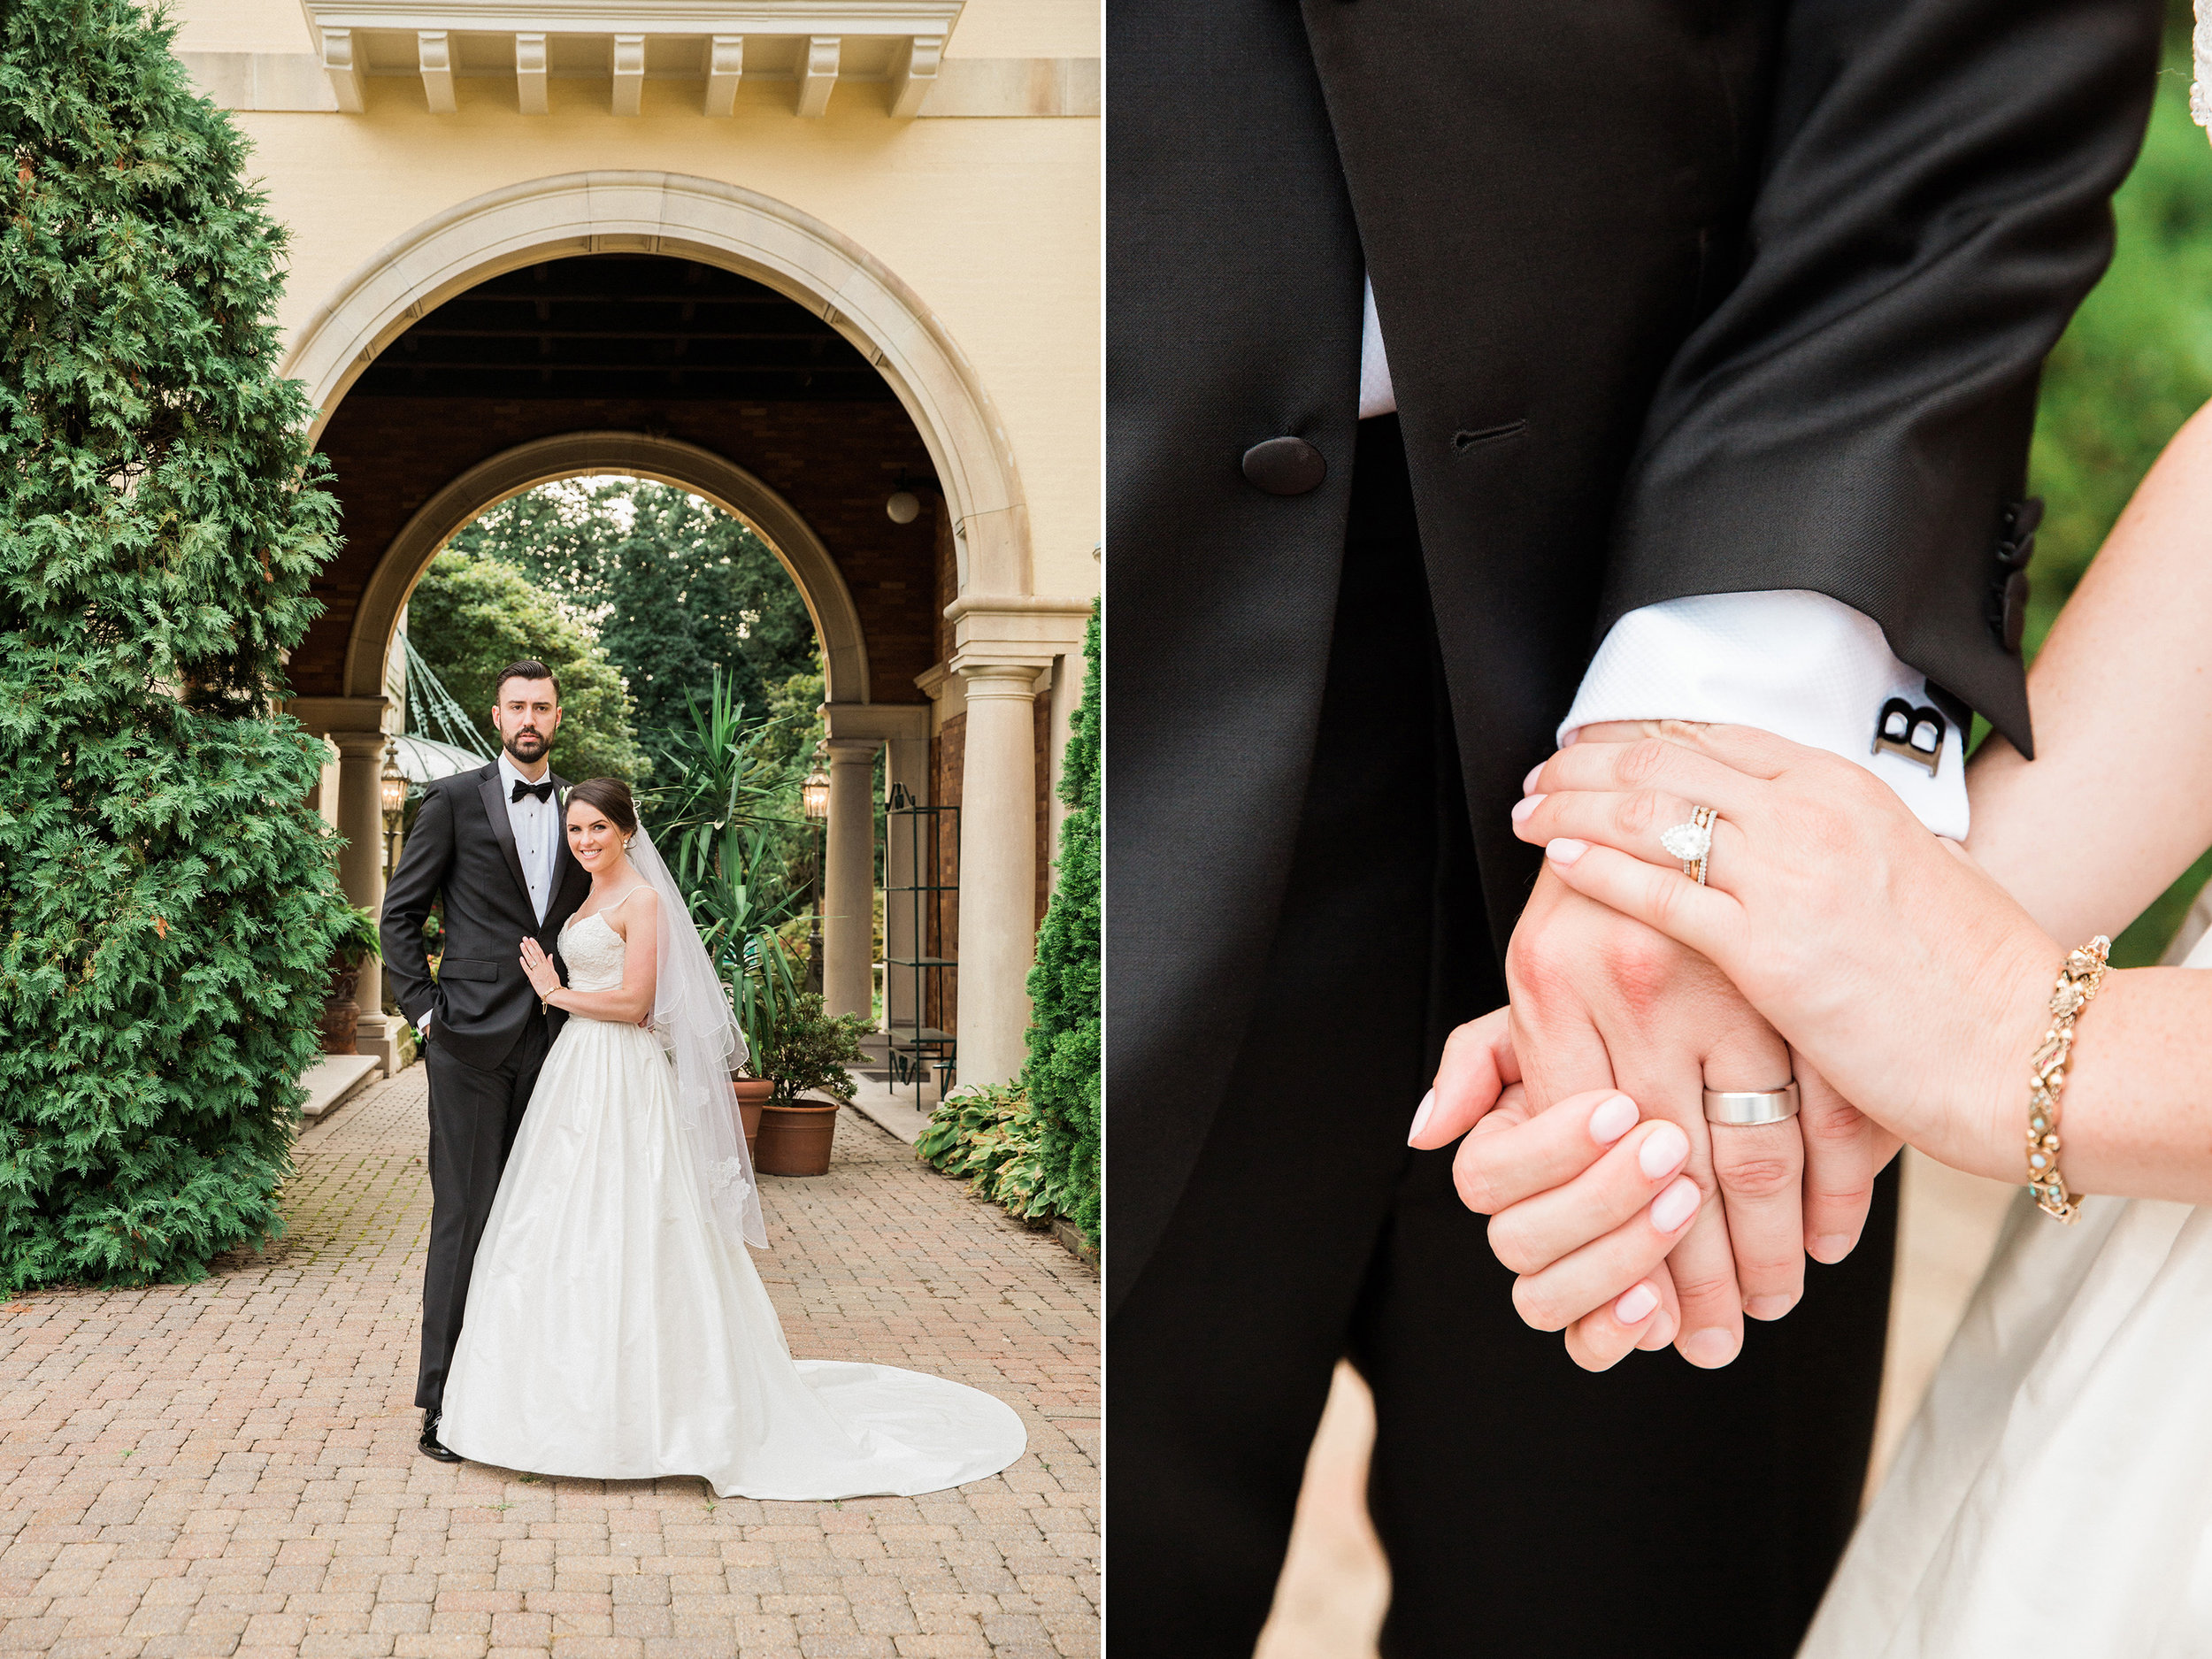 Evergreen-Museum-Balitmore-Maryland-Wedding-Black-Tie-Bride-036.jpg